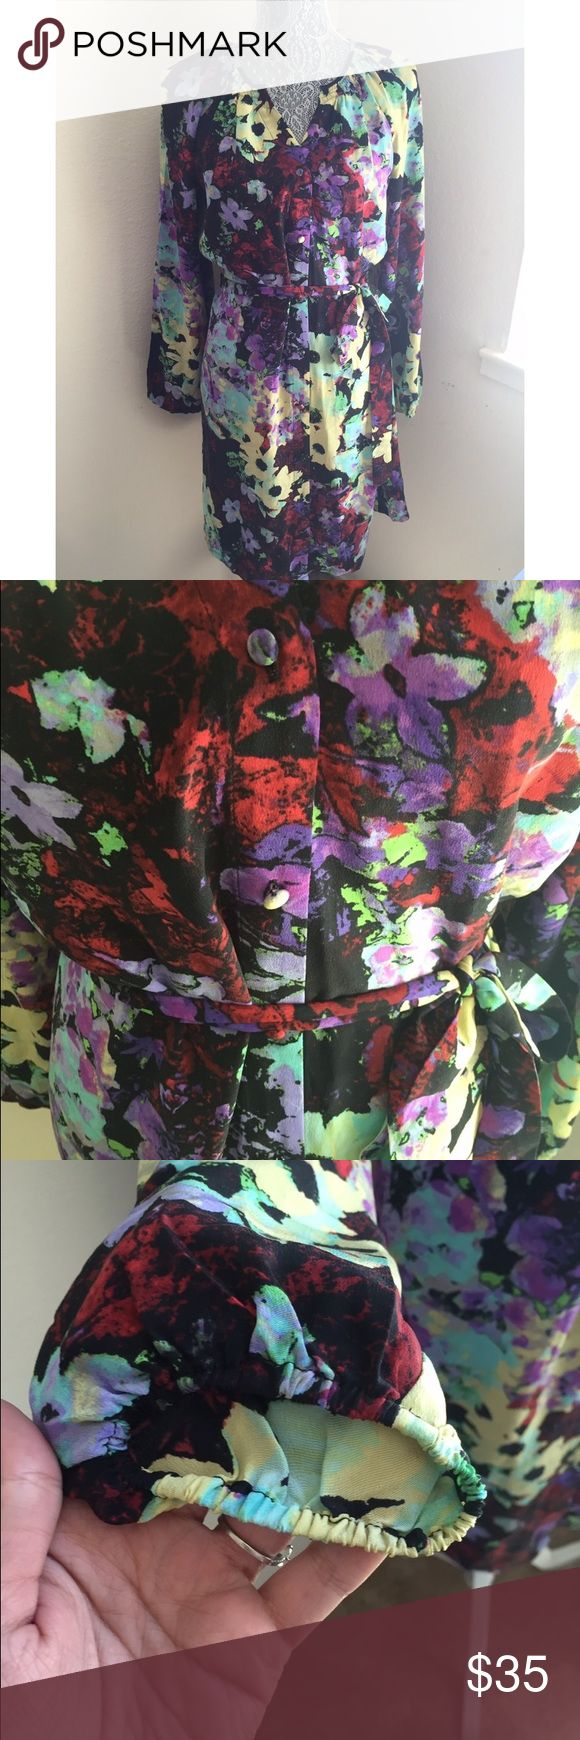 Charlie Jade long sleeve dress, sz small Gorgeous flowered print long sleeve Charlie jade dress. 100% silk. Has tie around the waist. Button up. charlie jade Dresses Midi